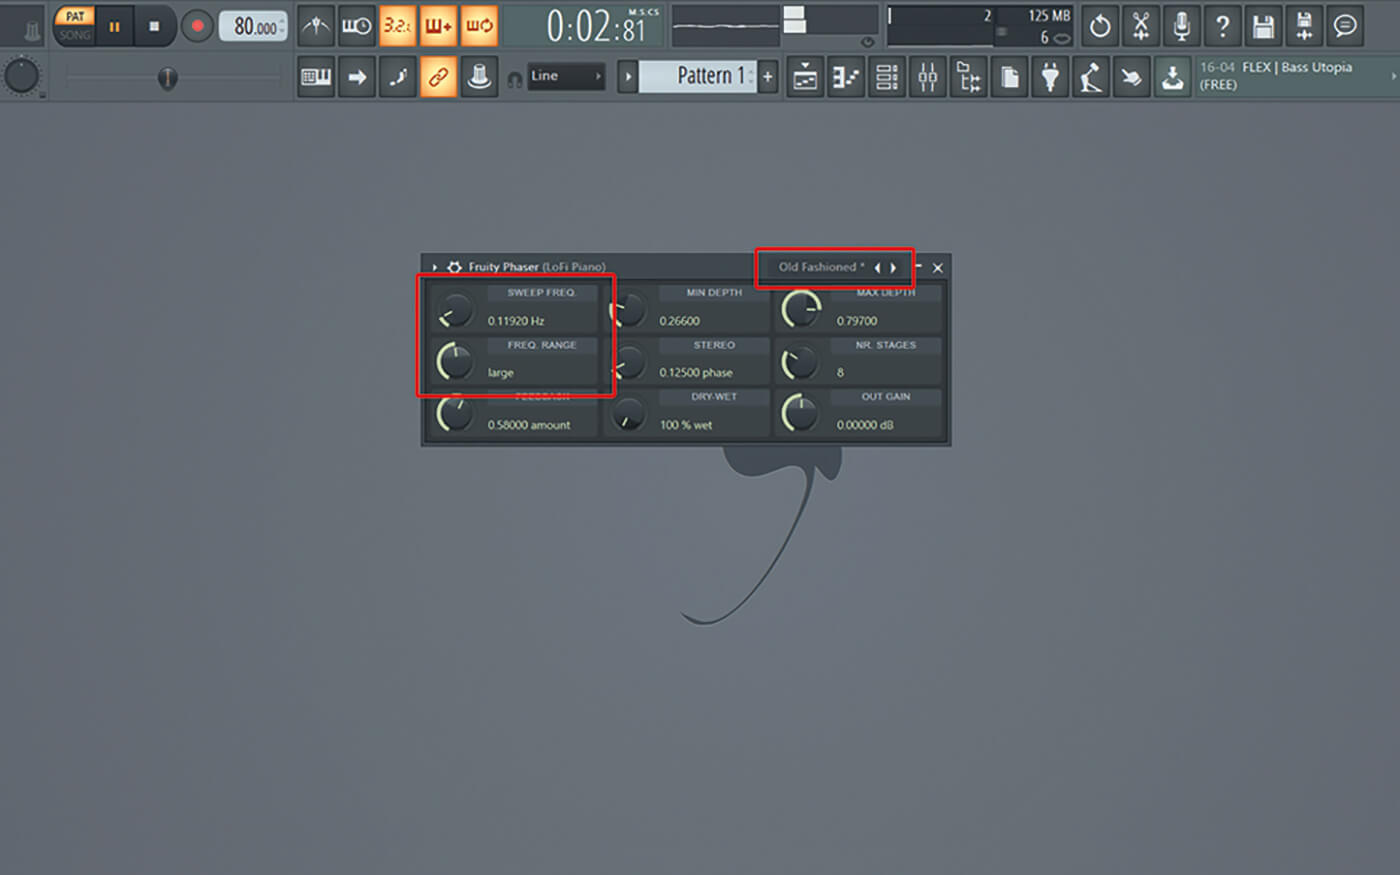 MT208 FLT Studio Lo-Fi Beats TUT 14